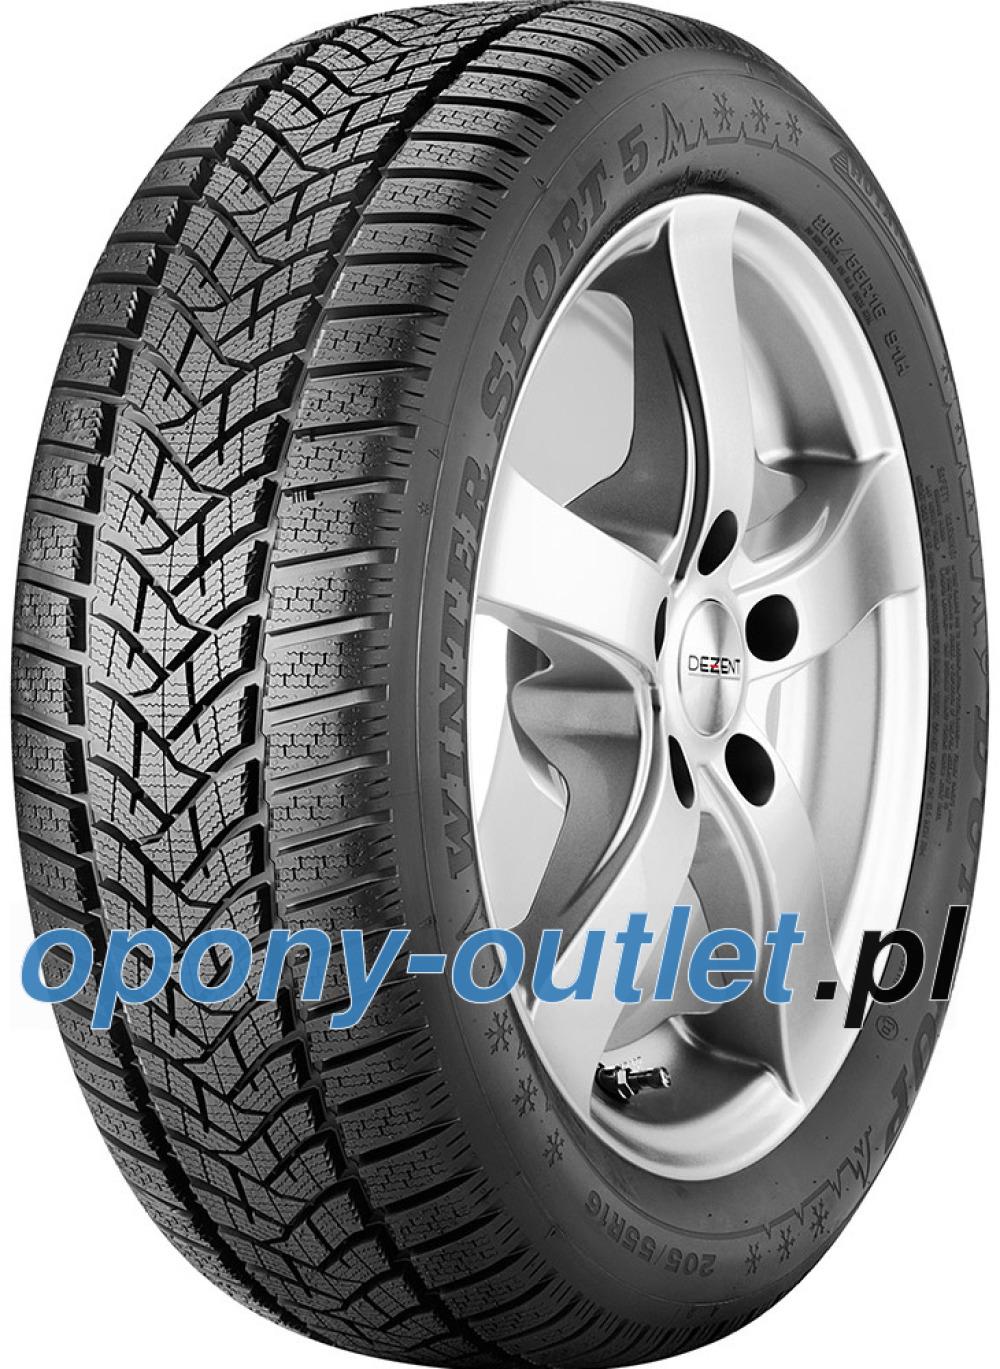 Dunlop Winter Sport 5 ( 235/65 R17 108H XL , SUV )